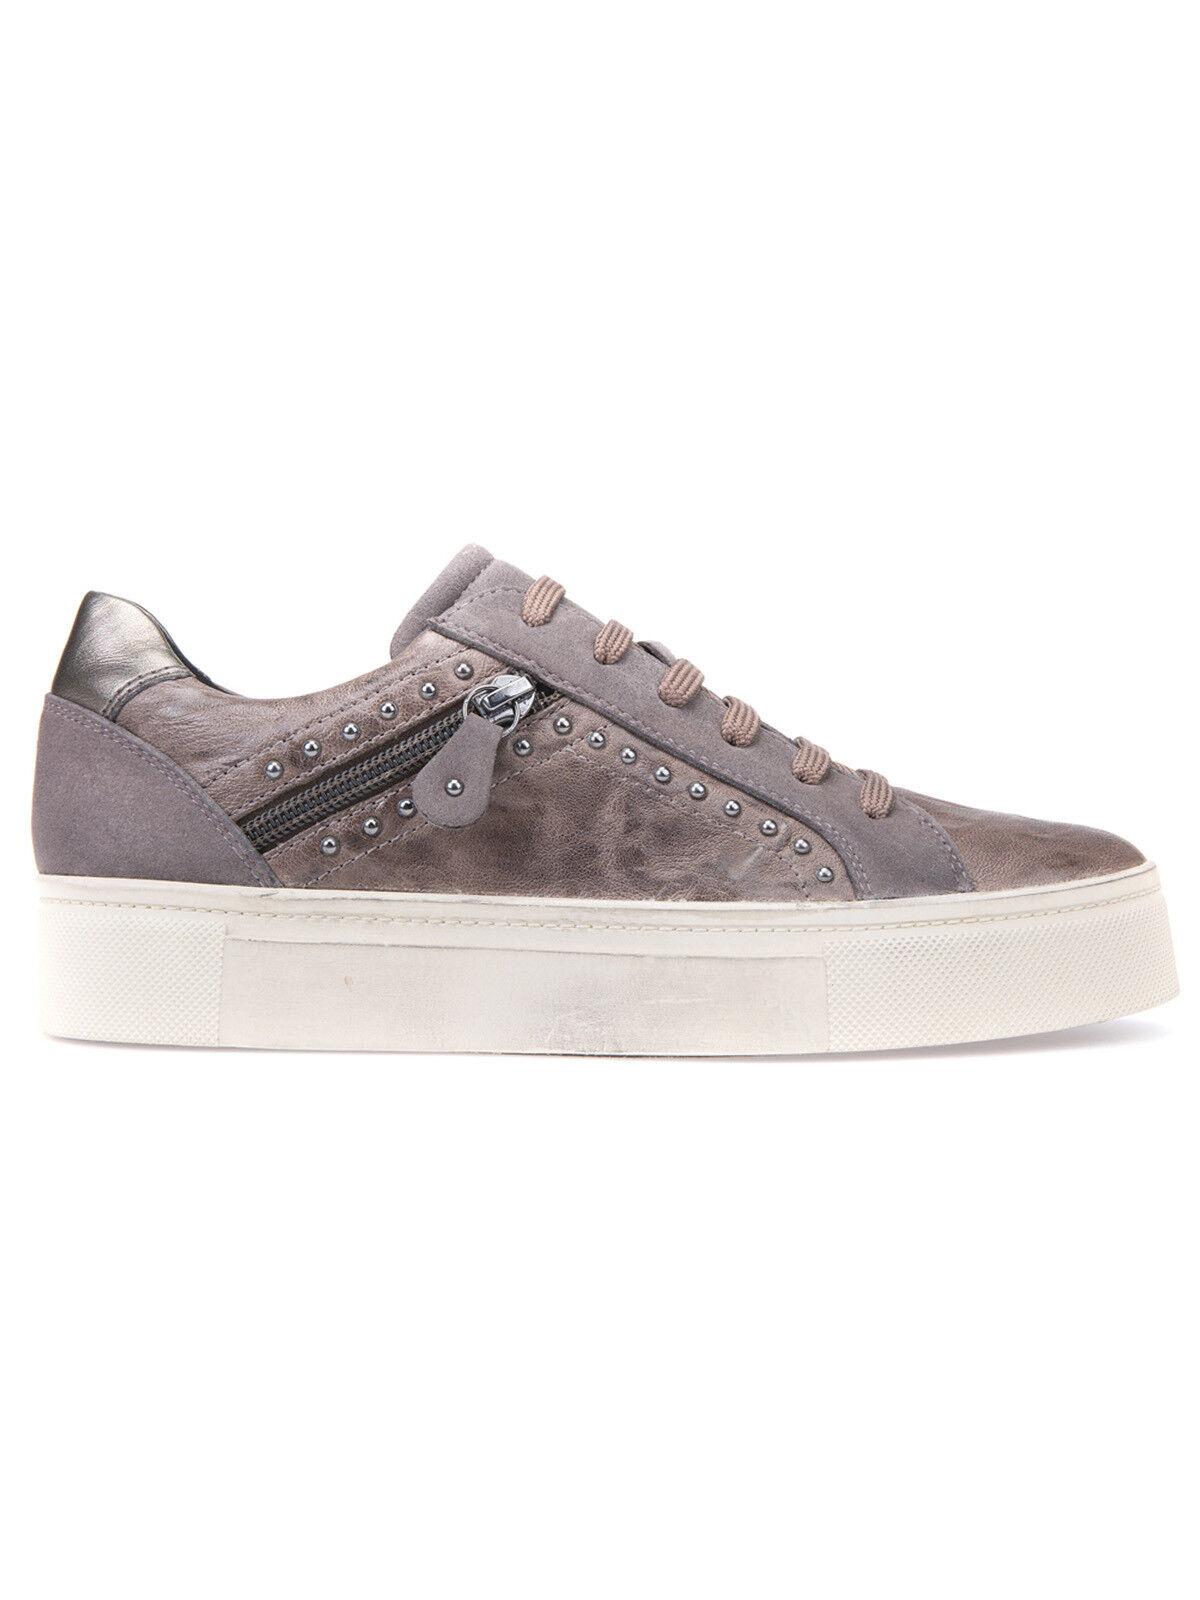 Sneakers Damenschuhe Geox HIDENCE D7434B0BTAFC6103